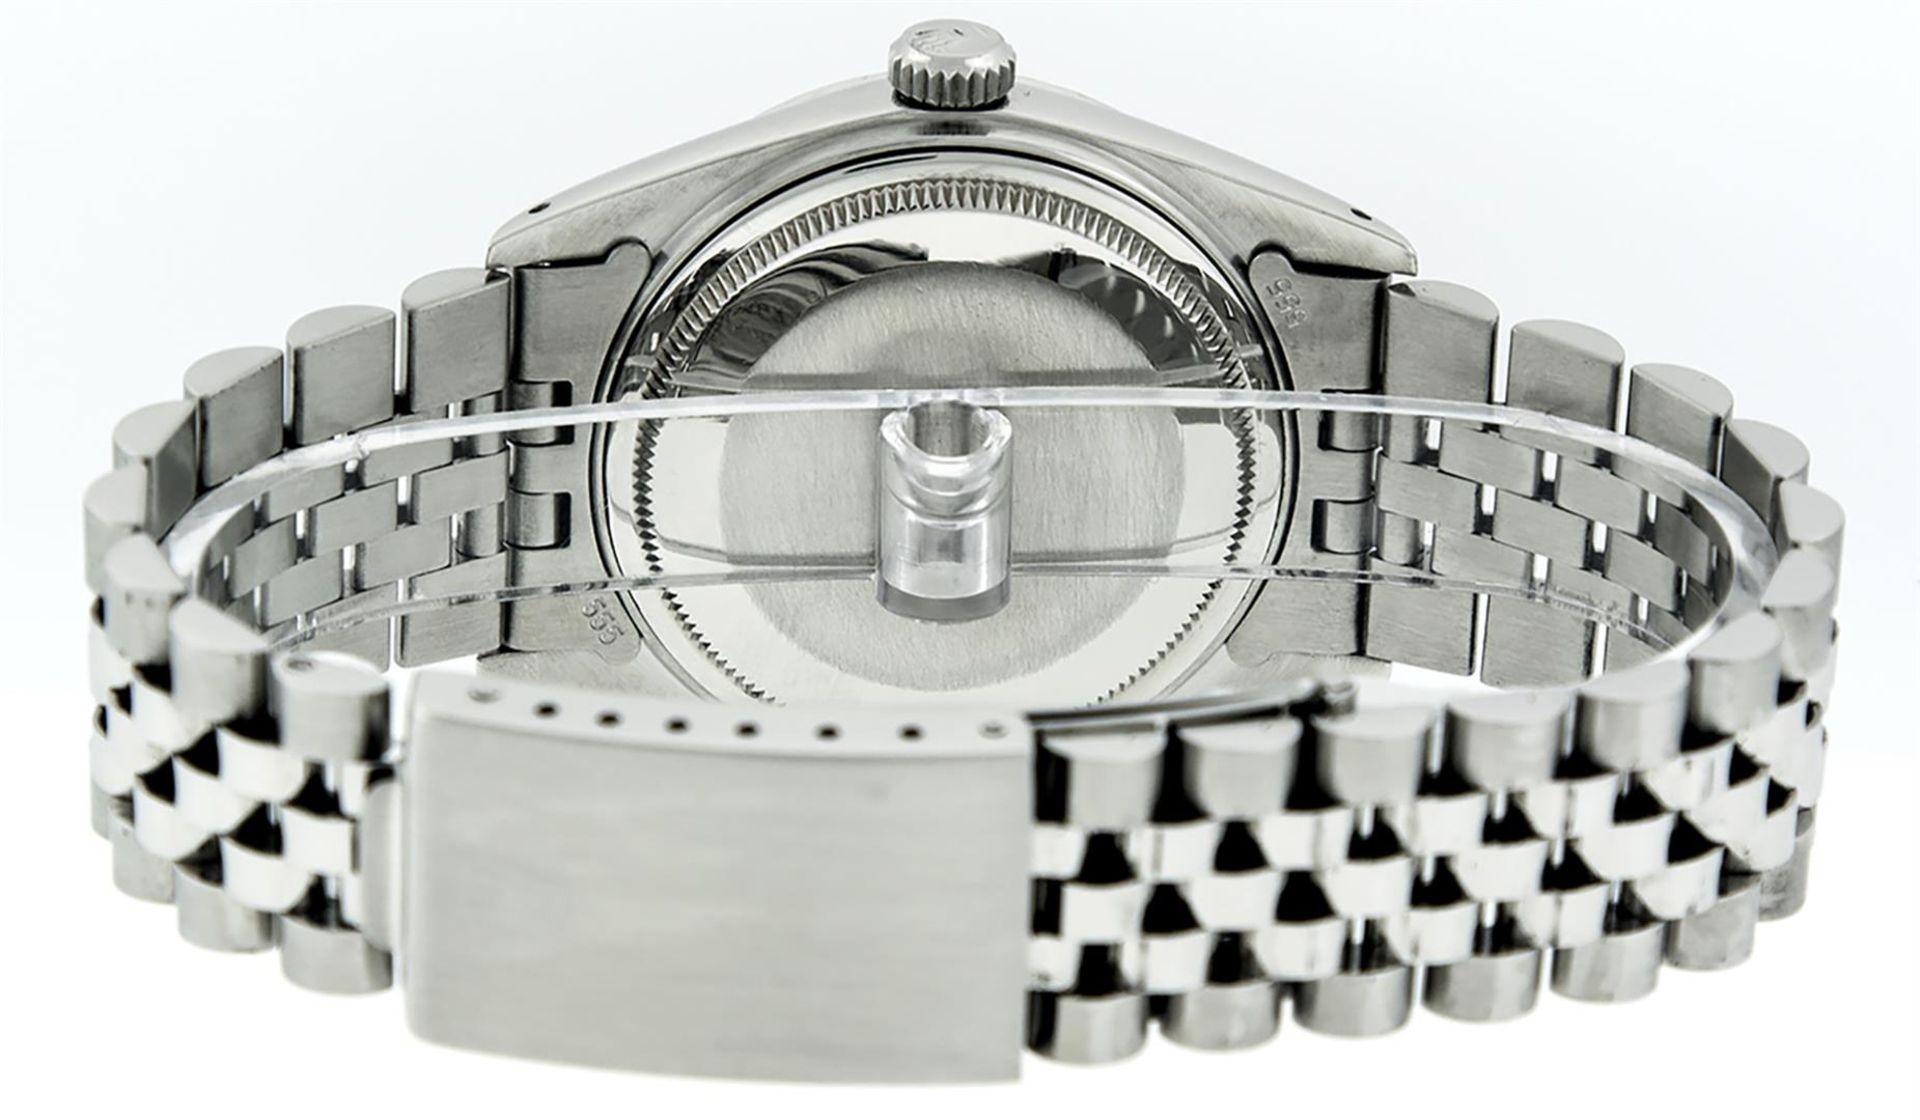 Rolex Mens Stainless Steel Diamond Lugs & Ruby Datejust Wristwatch - Image 8 of 8